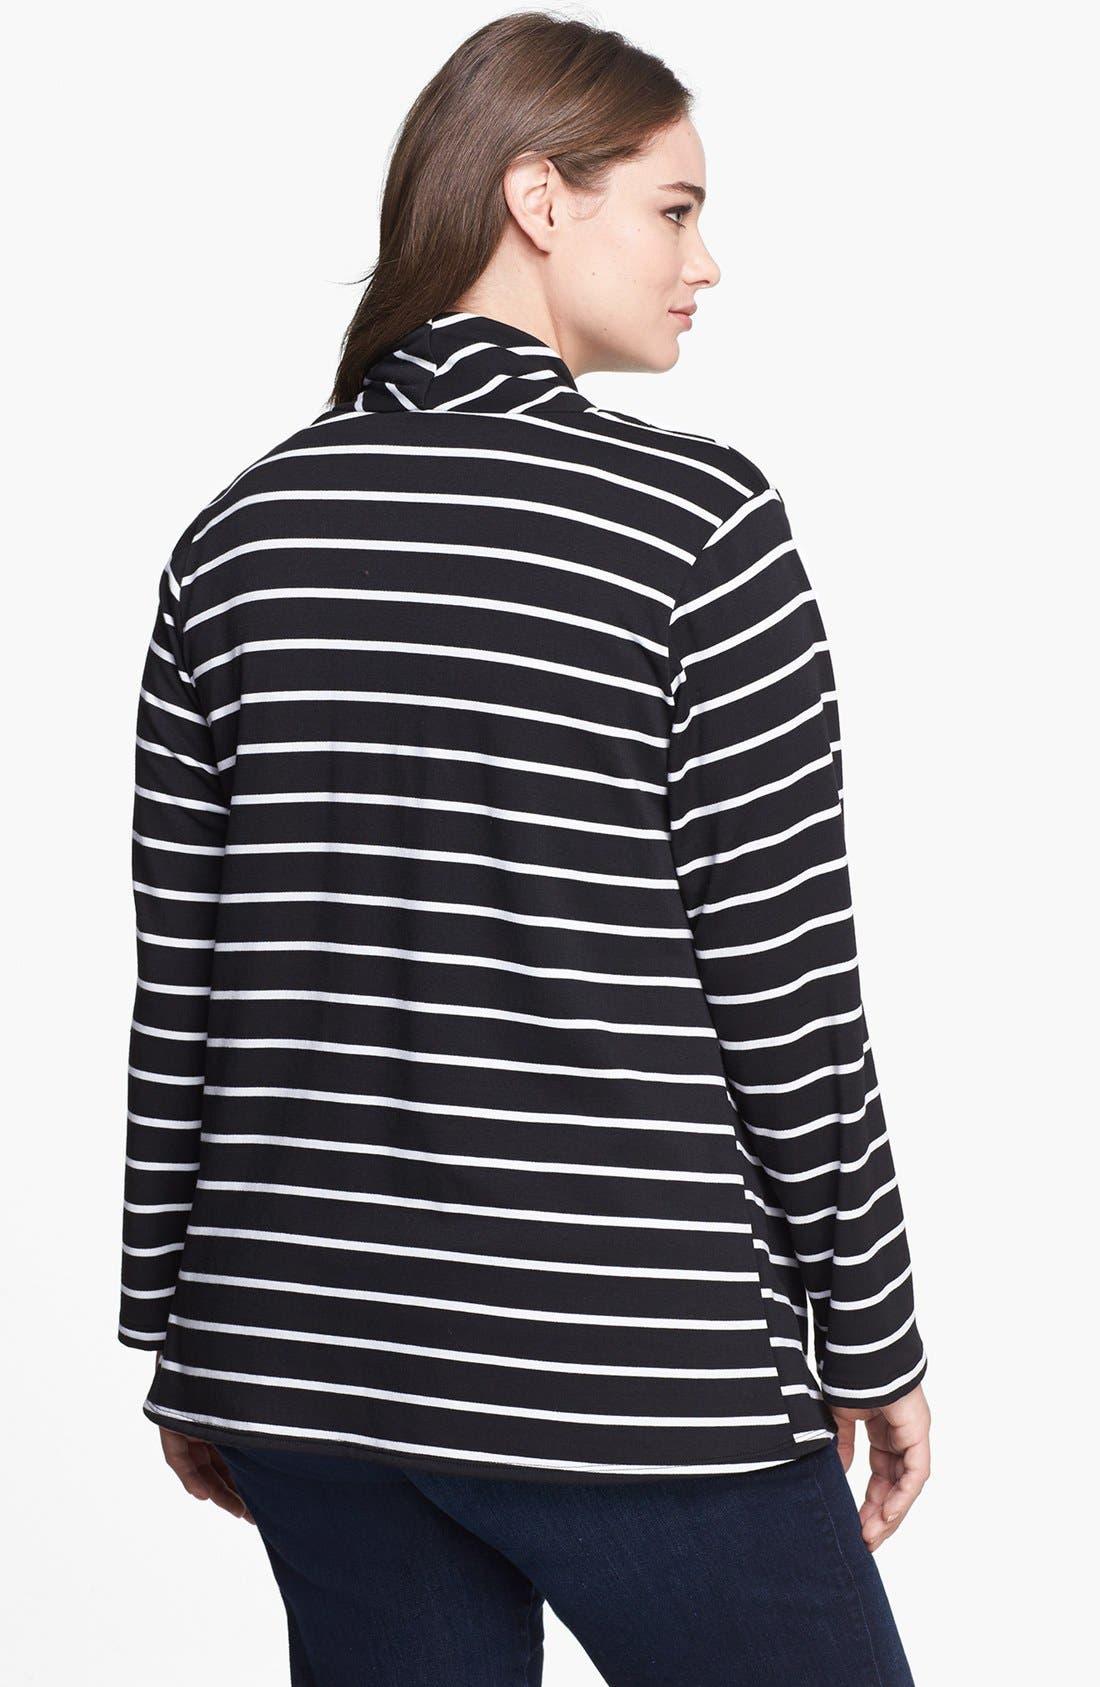 Stripe Fleece Wrap,                             Alternate thumbnail 2, color,                             Ivory Stripe